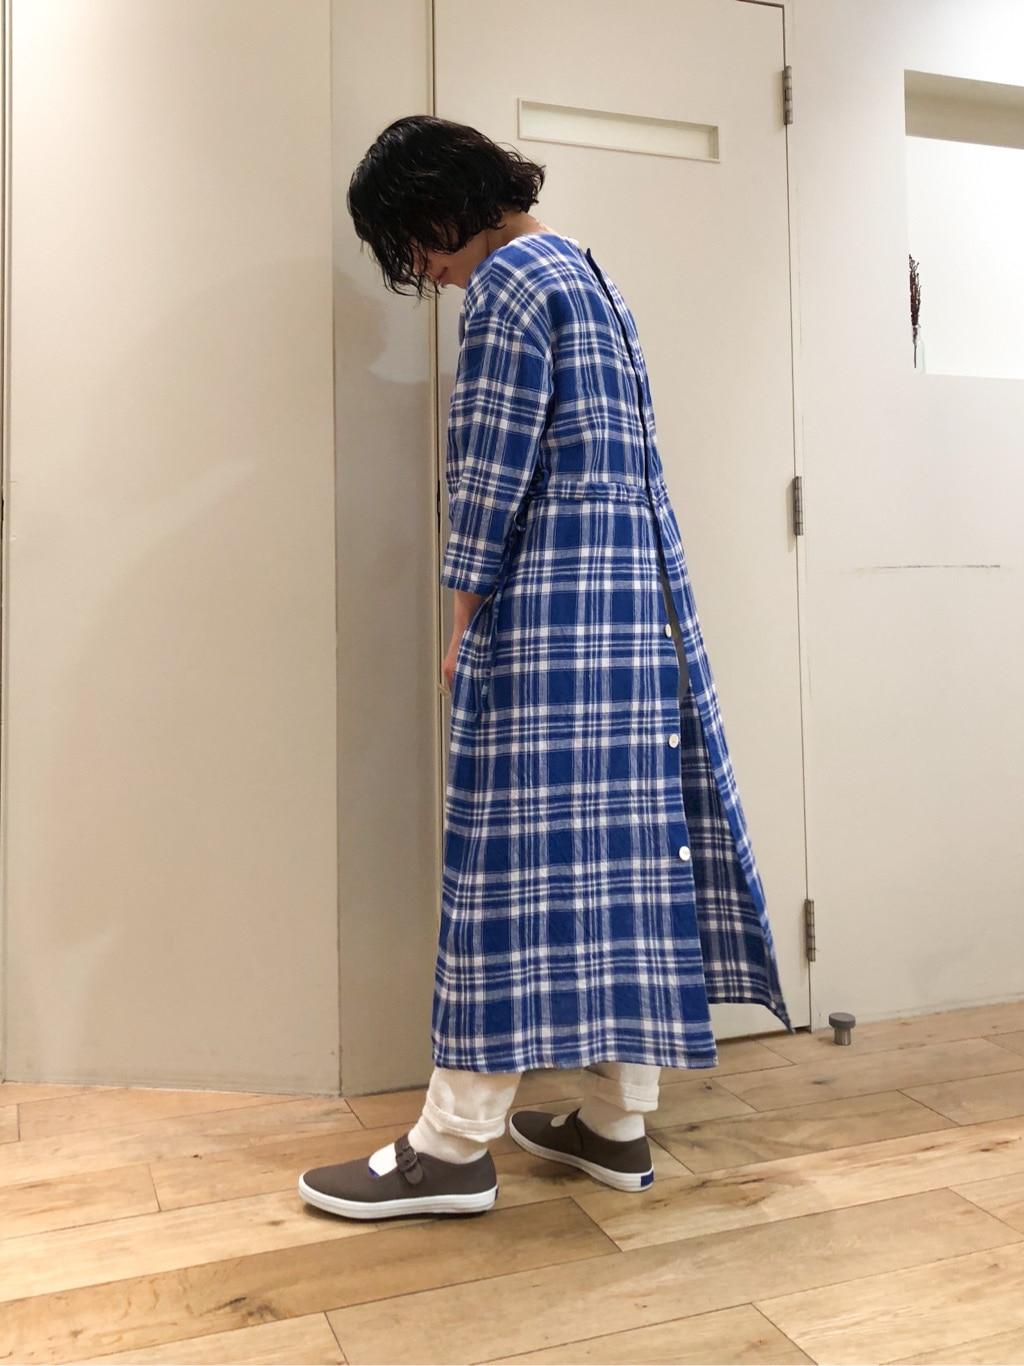 bulle de savon 新宿ミロード 身長:156cm 2021.03.09